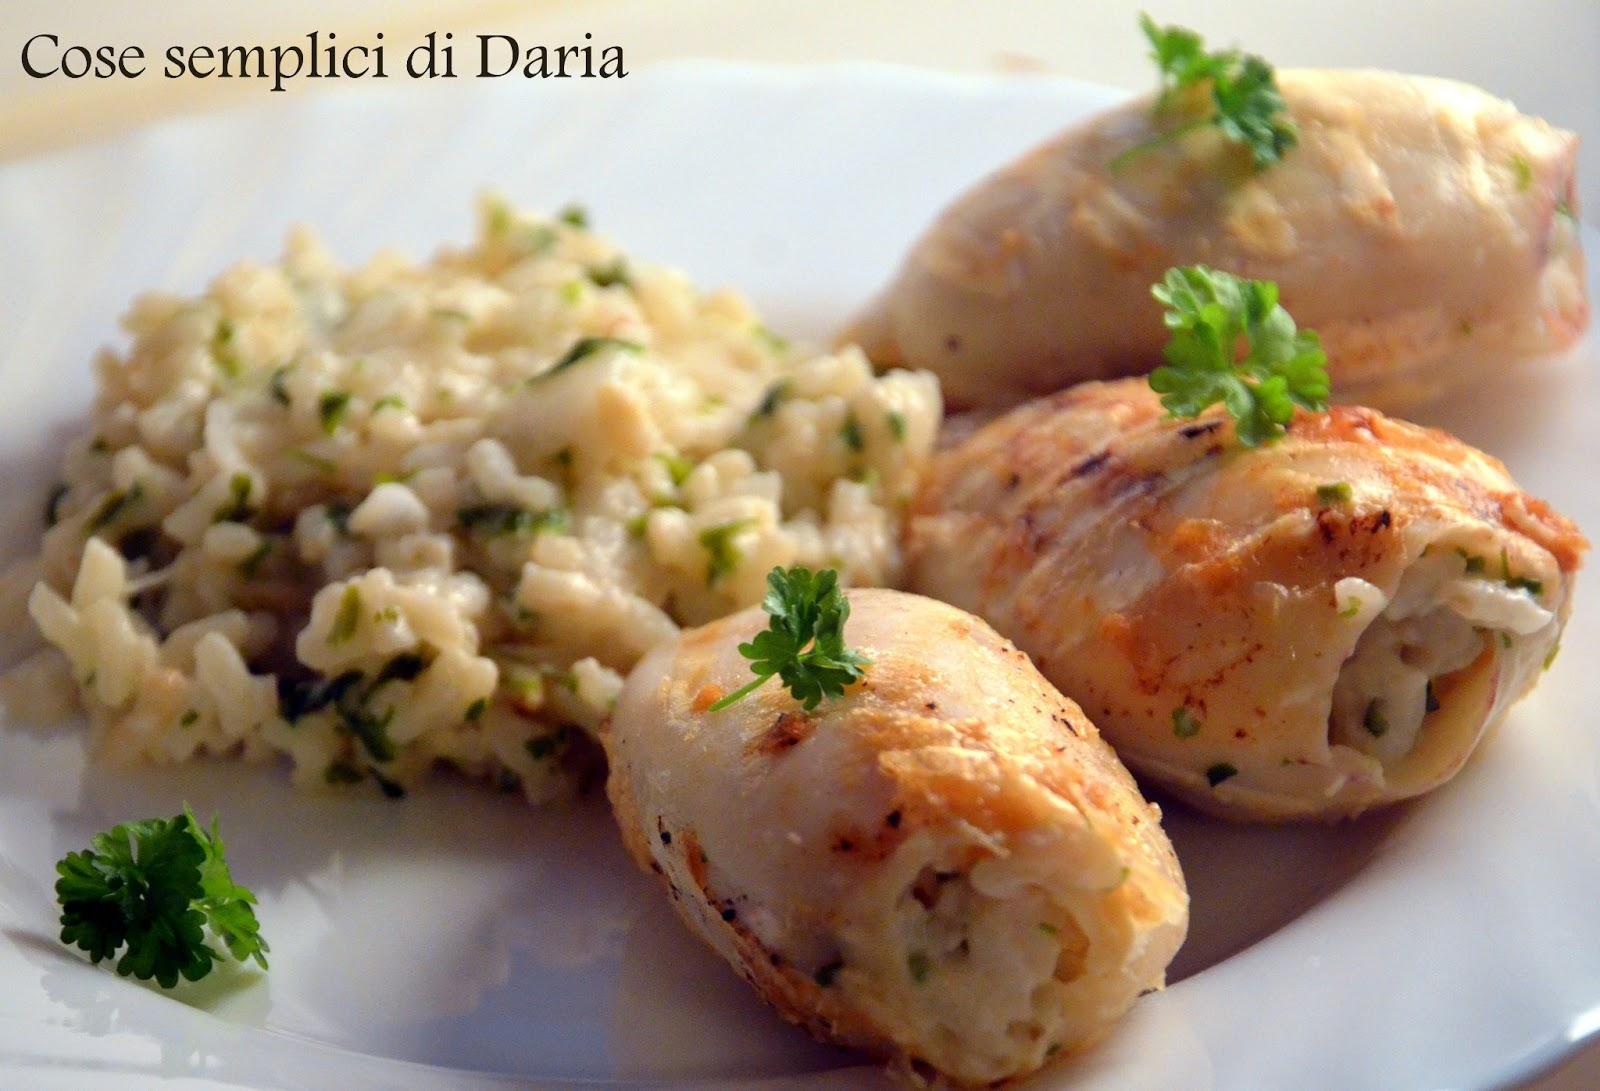 Салат с кальмаром рецепт с фото пошагово 59